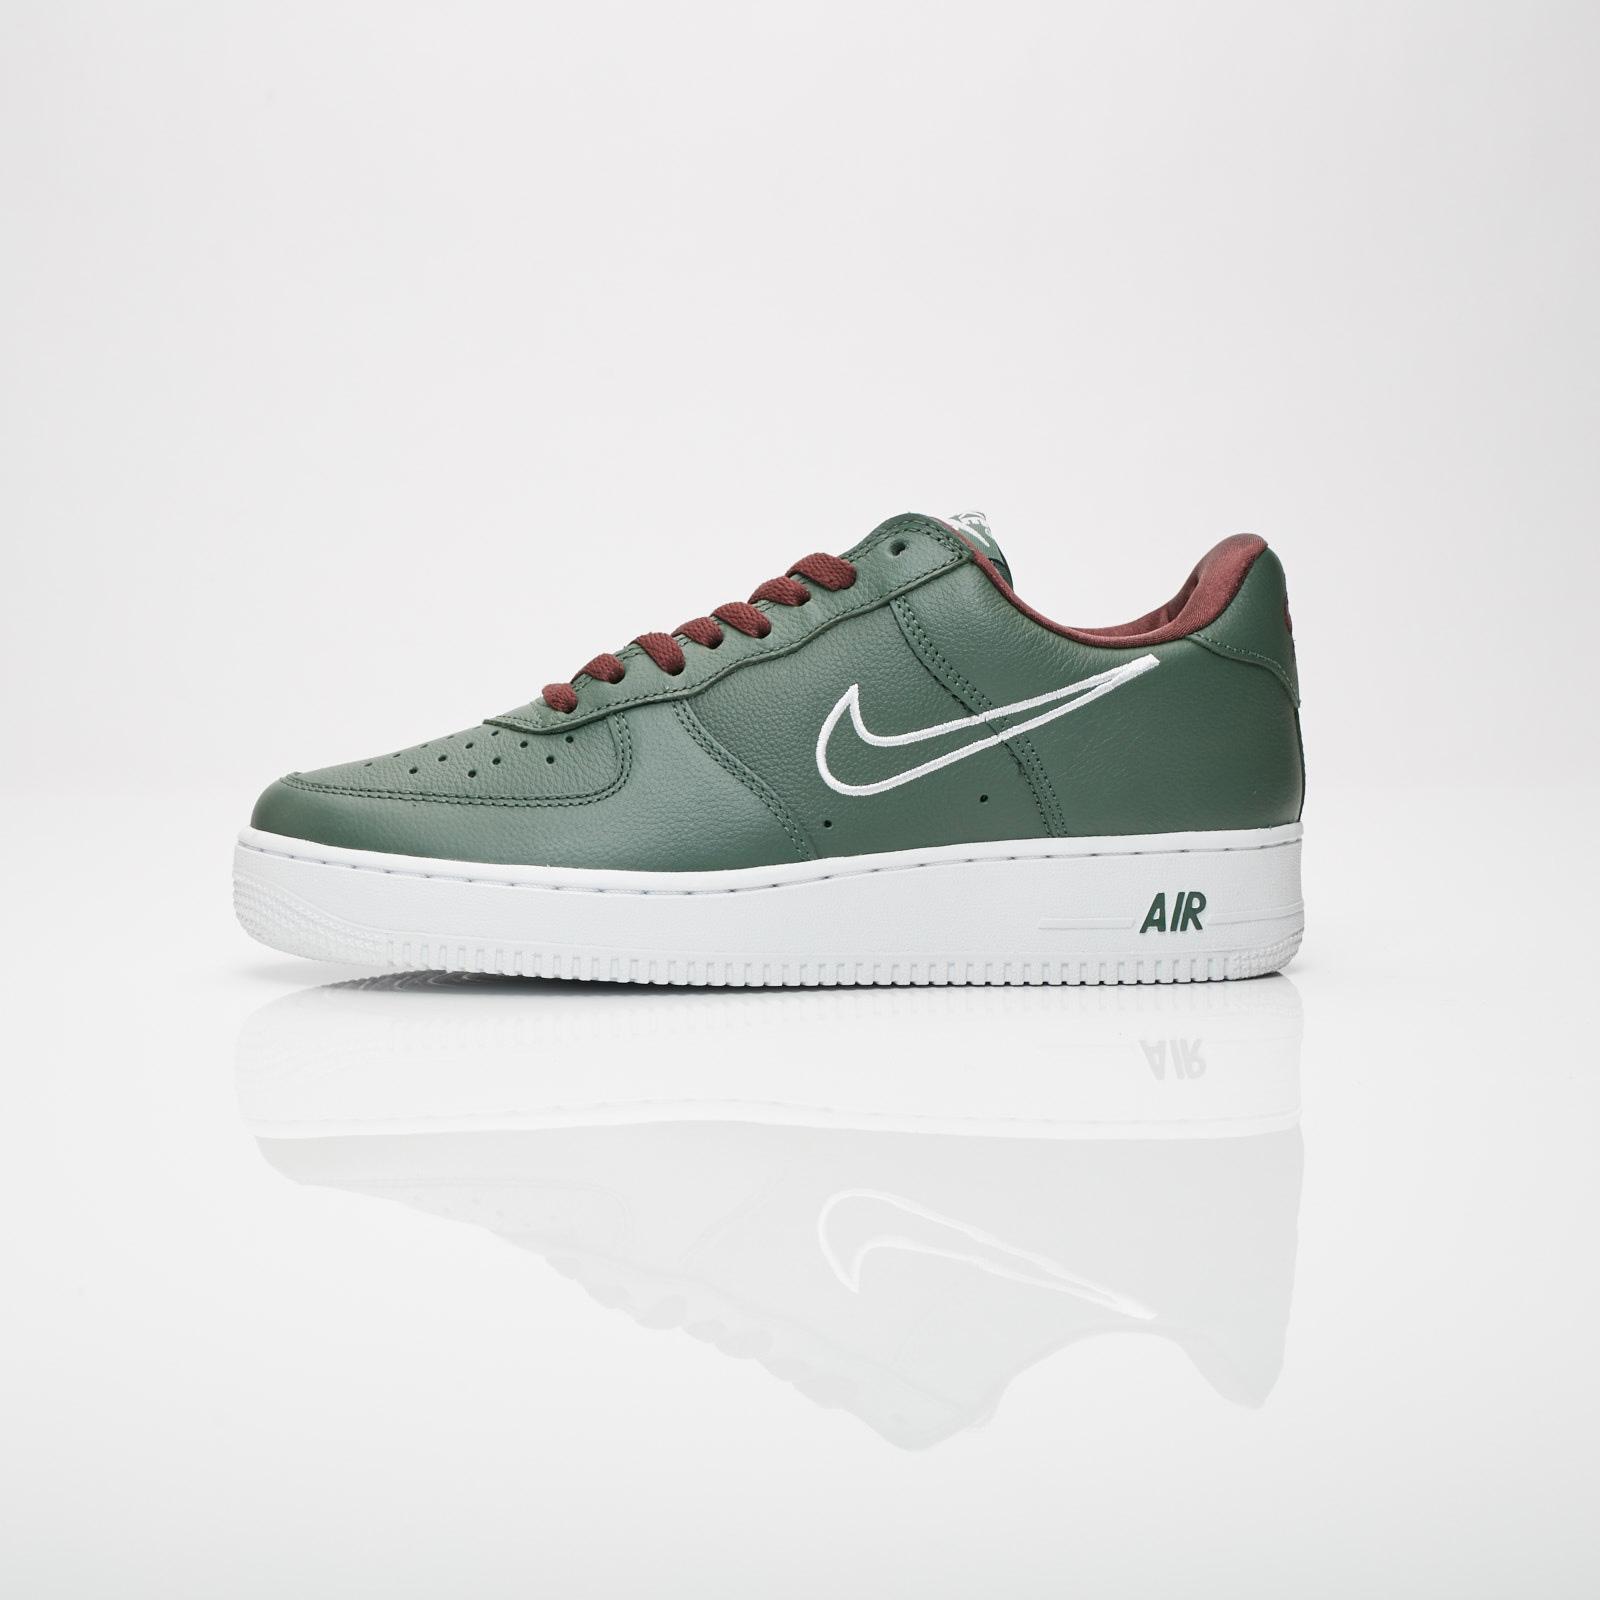 efbd42f32657 Nike Air Force 1 Low Retro Hong Kong - 845053-300 - Sneakersnstuff ...